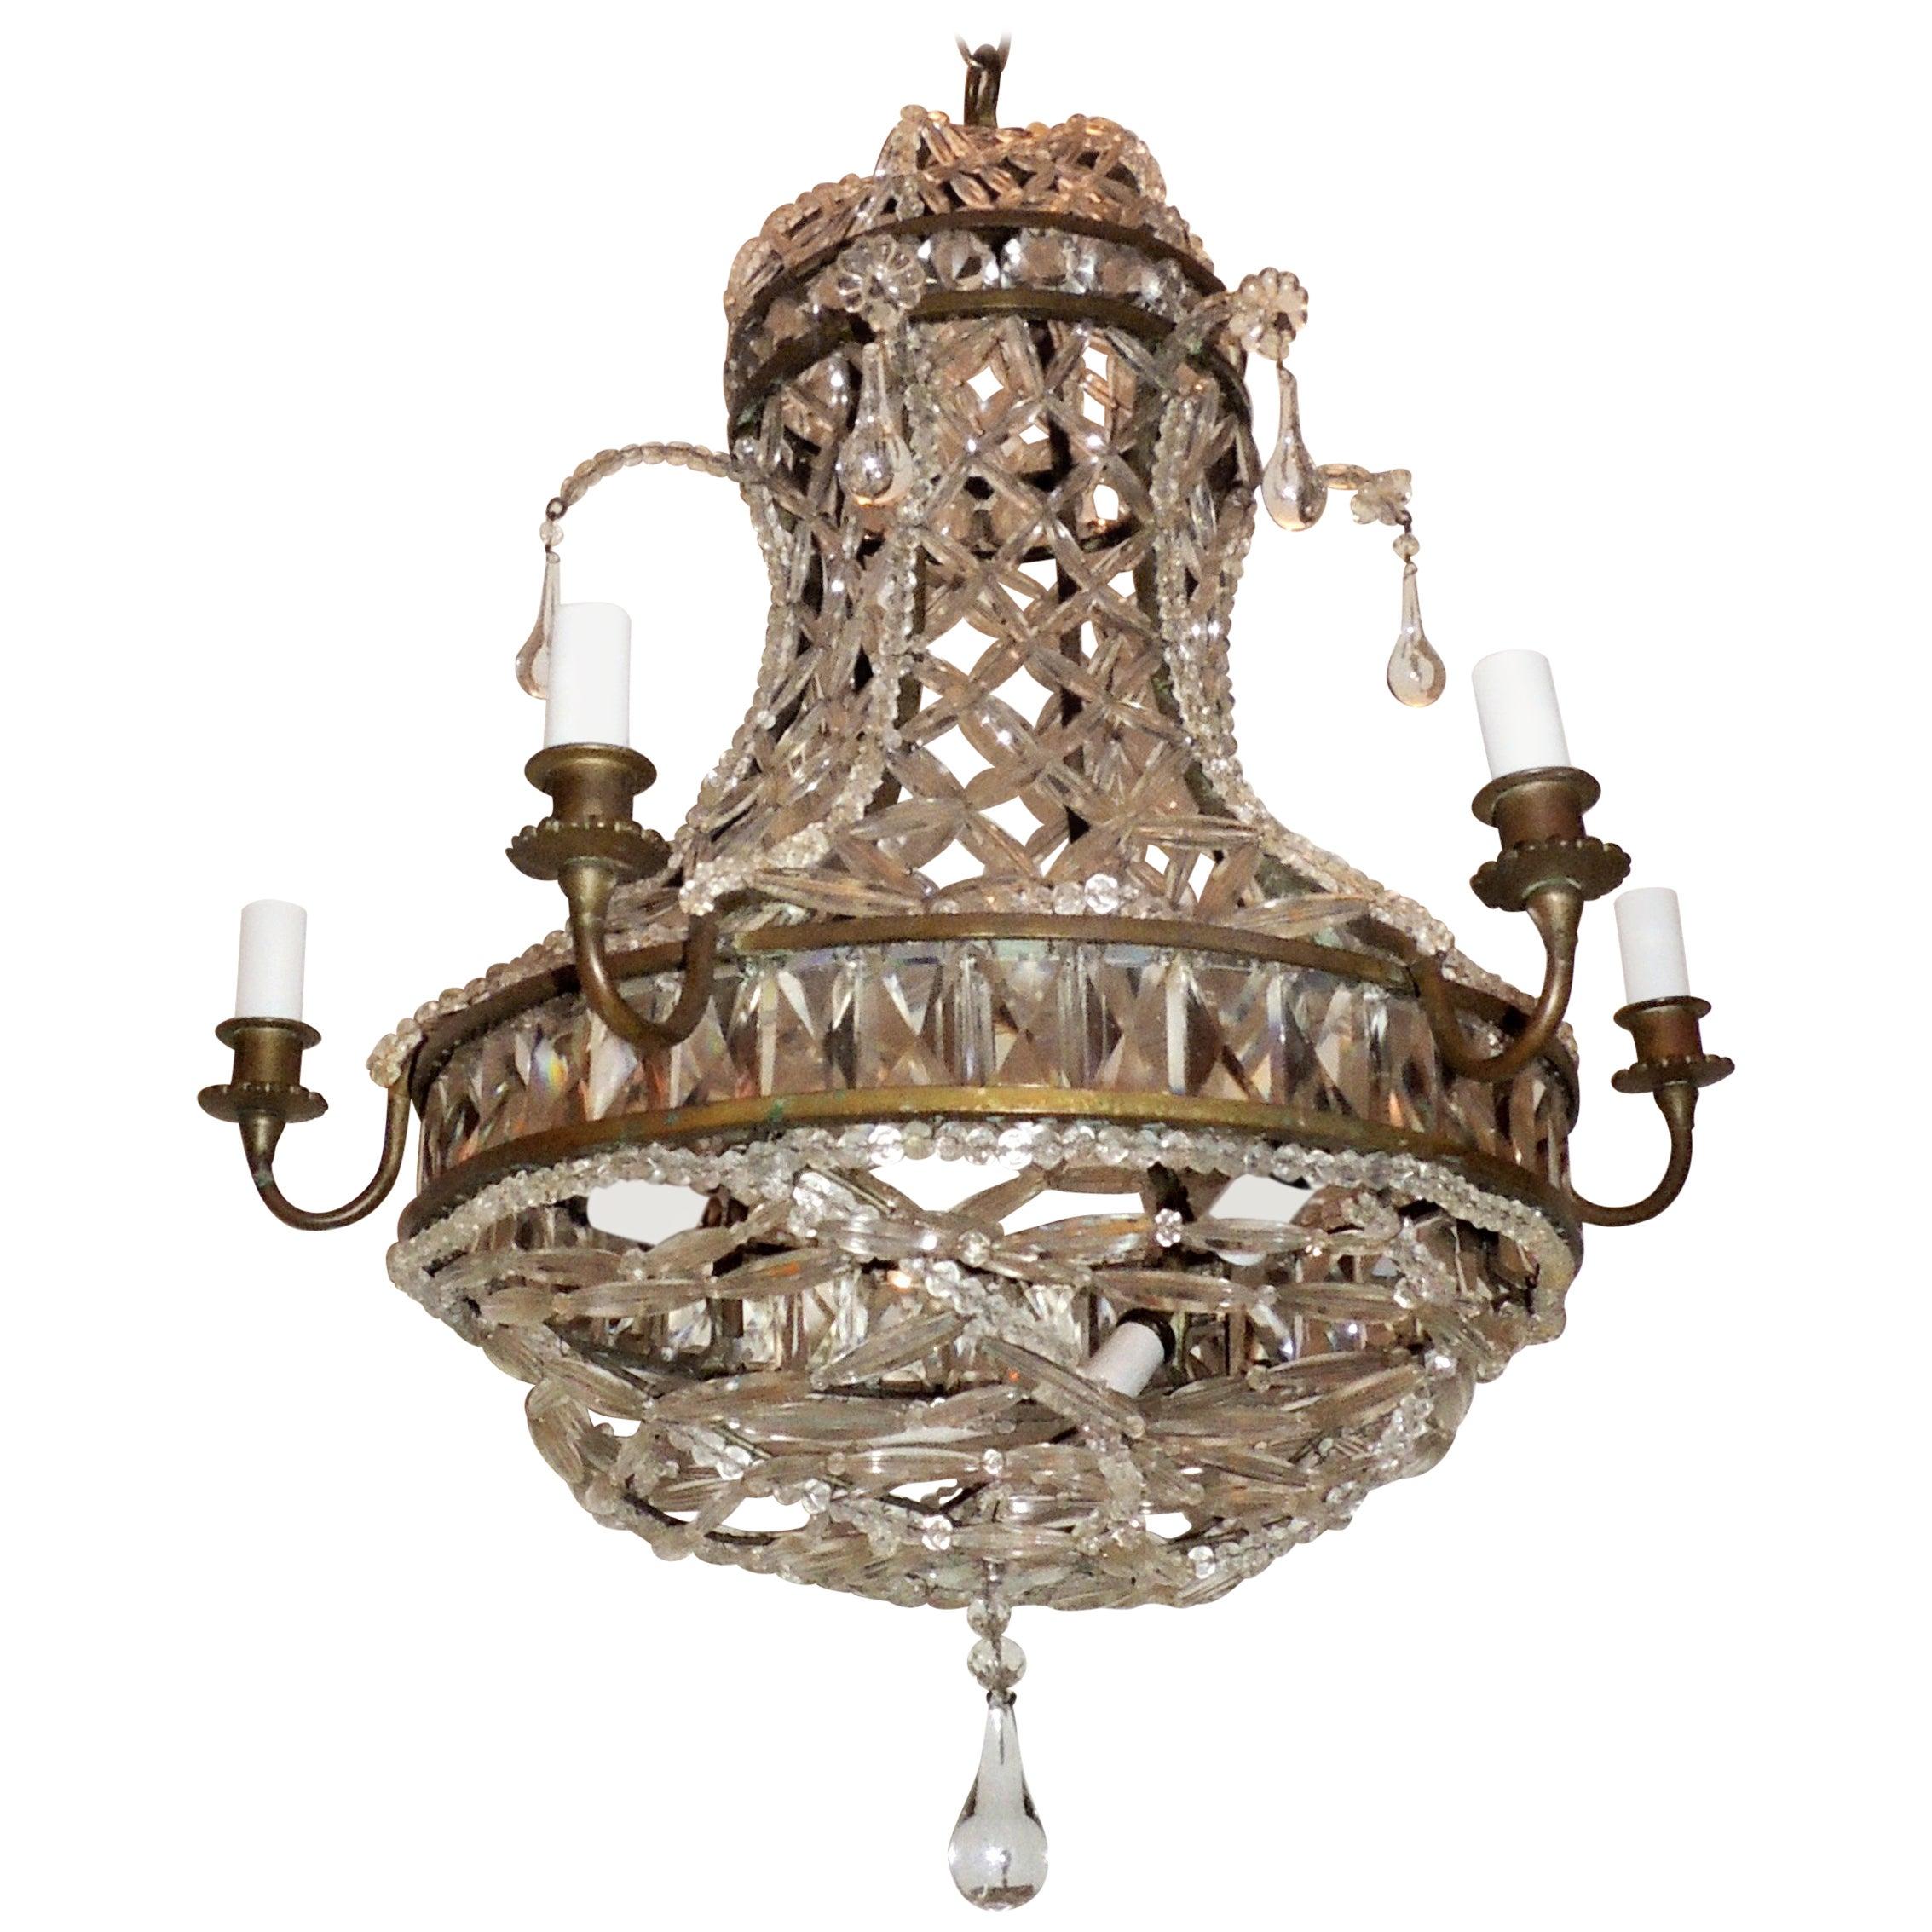 Wonderful French Bronze Crystal Lattice Beaded Basket Drop Chandelier Fixture